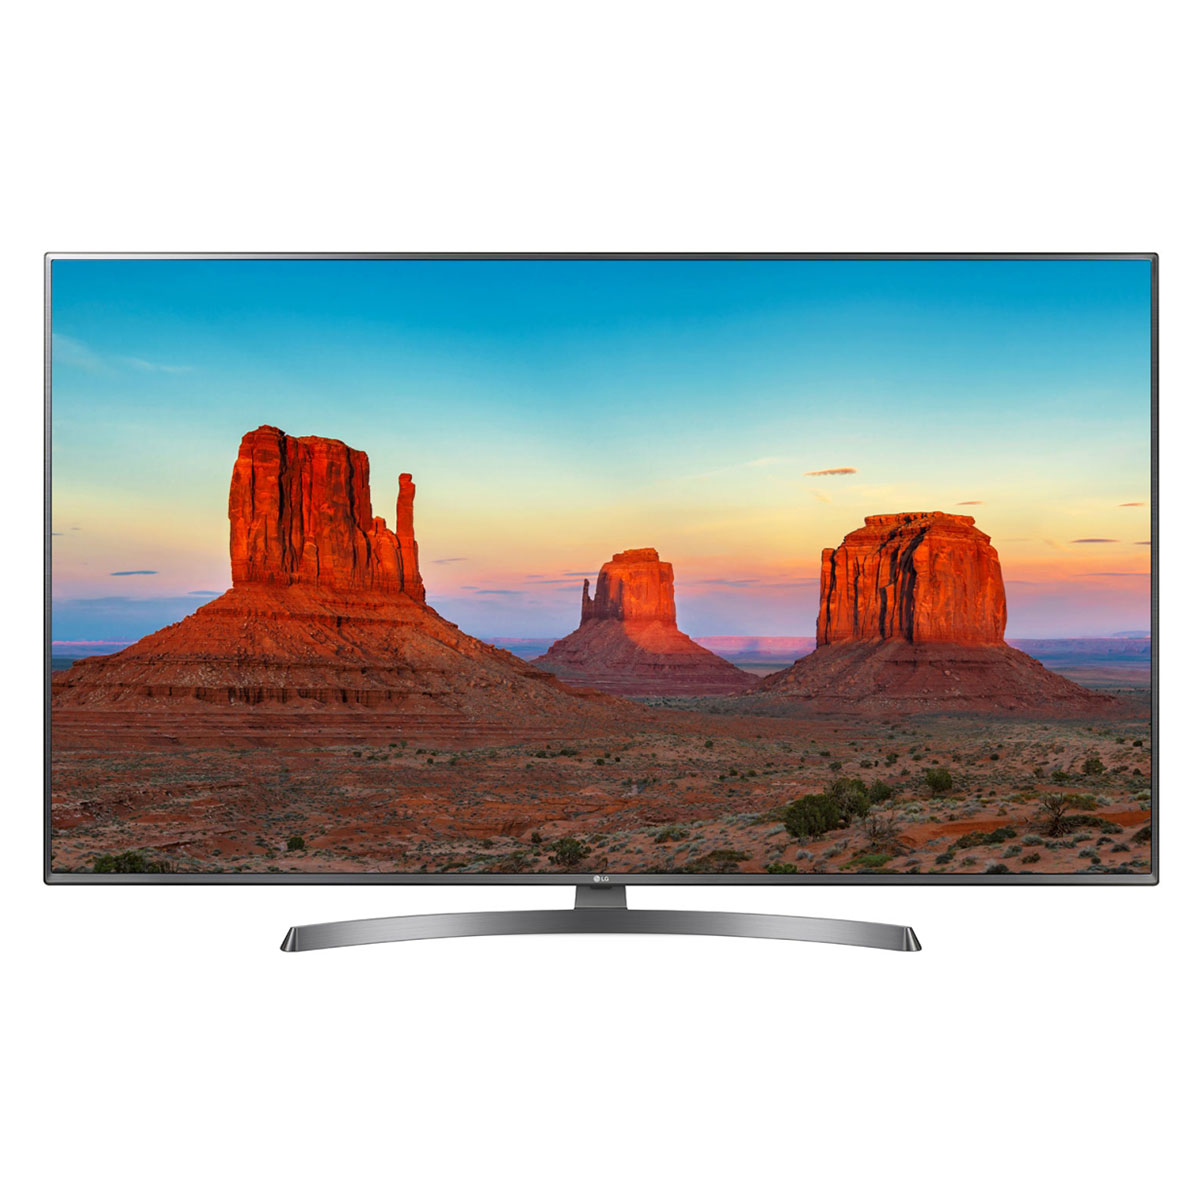 "TV LG 65UK6750 Téléviseur LED 4K 65"" (165 cm) 16/9 - 3840 x 2160 pixels - Ultra HD 2160p - HDR - Wi-Fi - Bluetooth - Assistant Google"